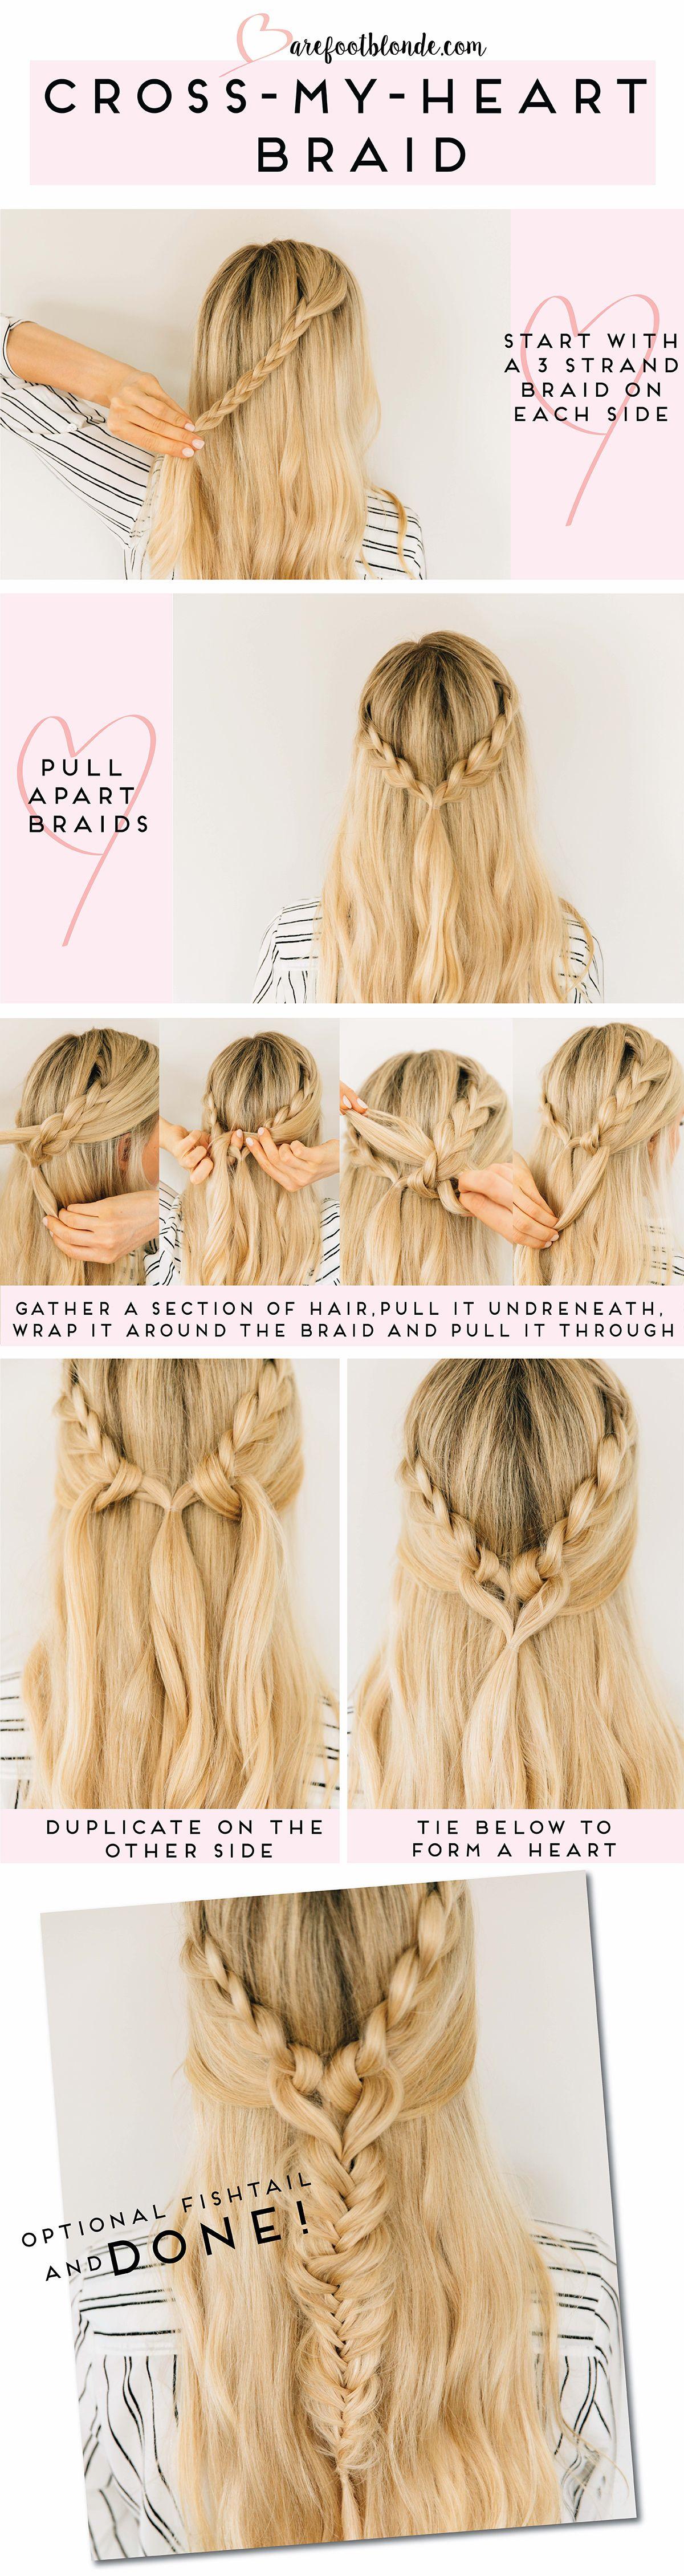 Amber fillerupus cross my heart braid tutorial fryzury pinterest